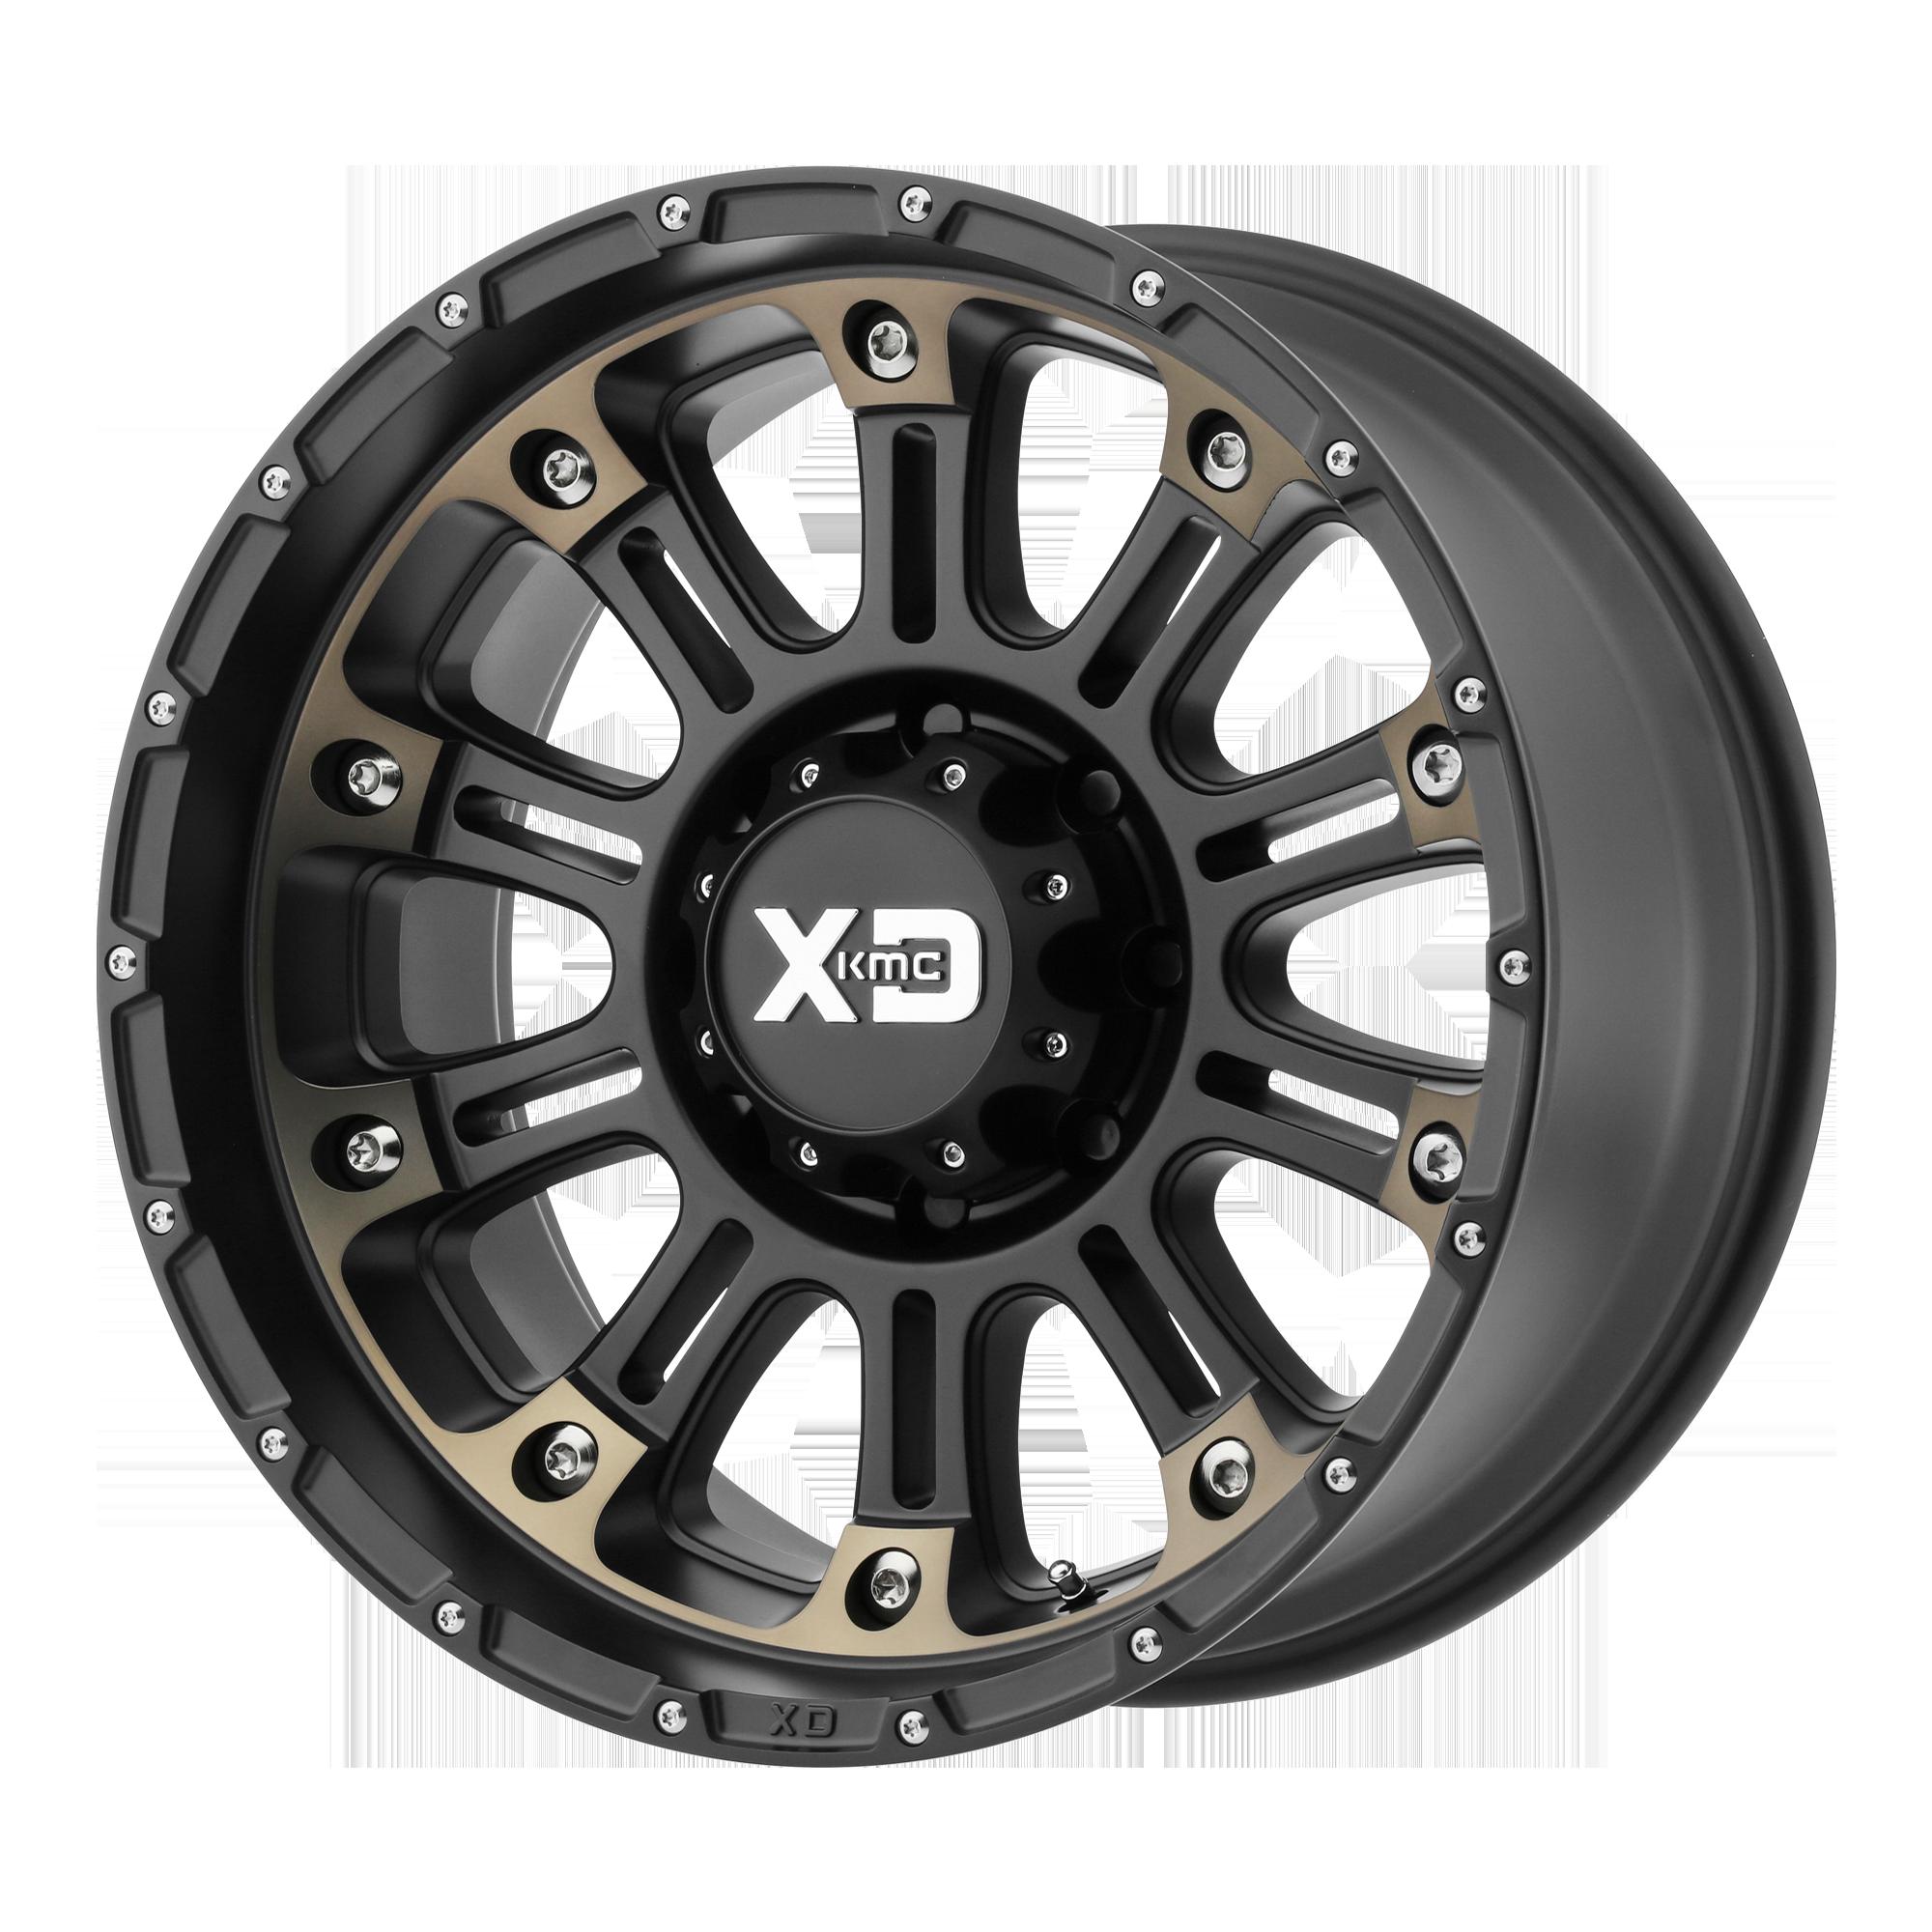 XD SERIES XD829 HOSS II hliníkové disky 12x22 8x170 ET-44 Satin Black Machined Dark Tint